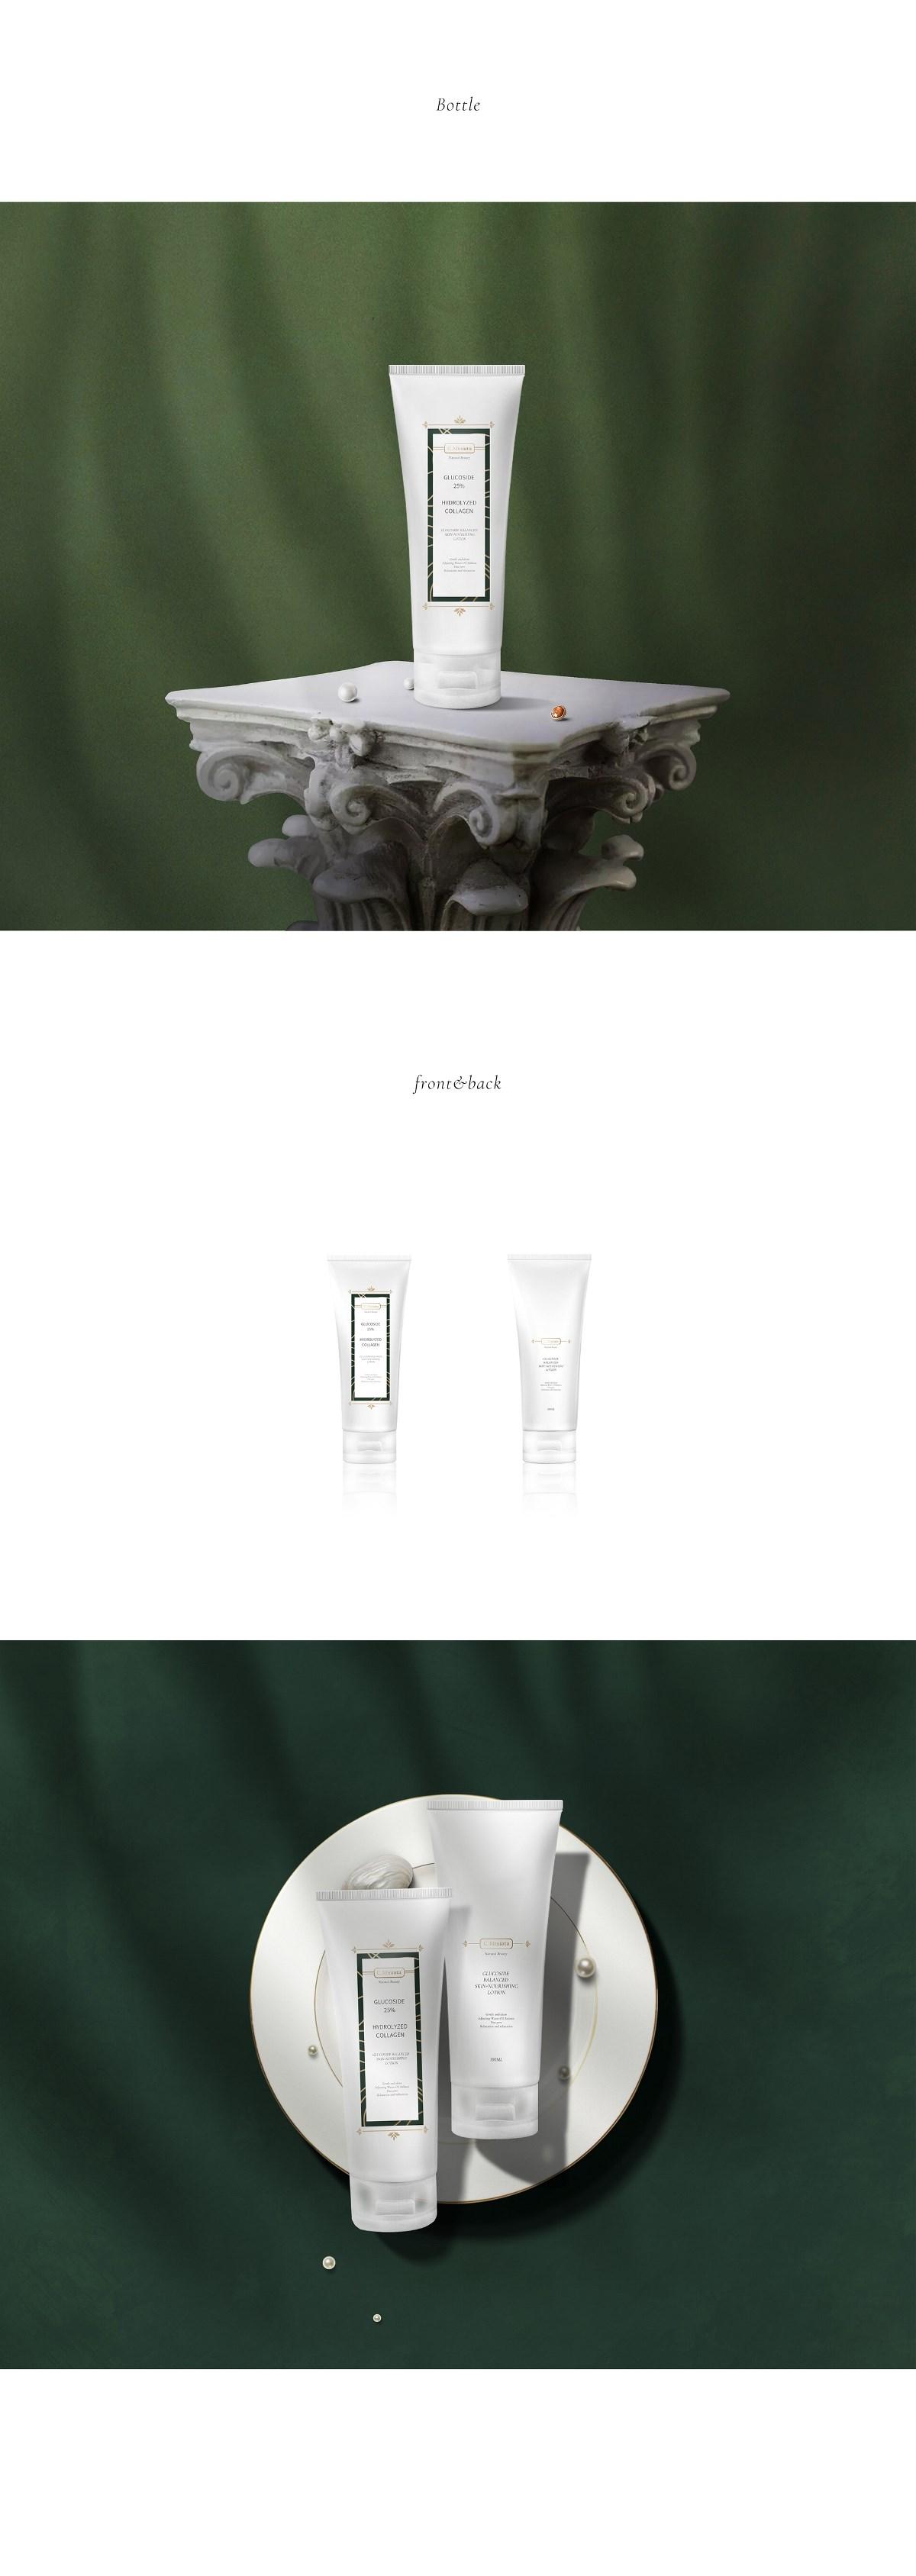 C.miniata法式护肤品牌系列产品包装设计及升级